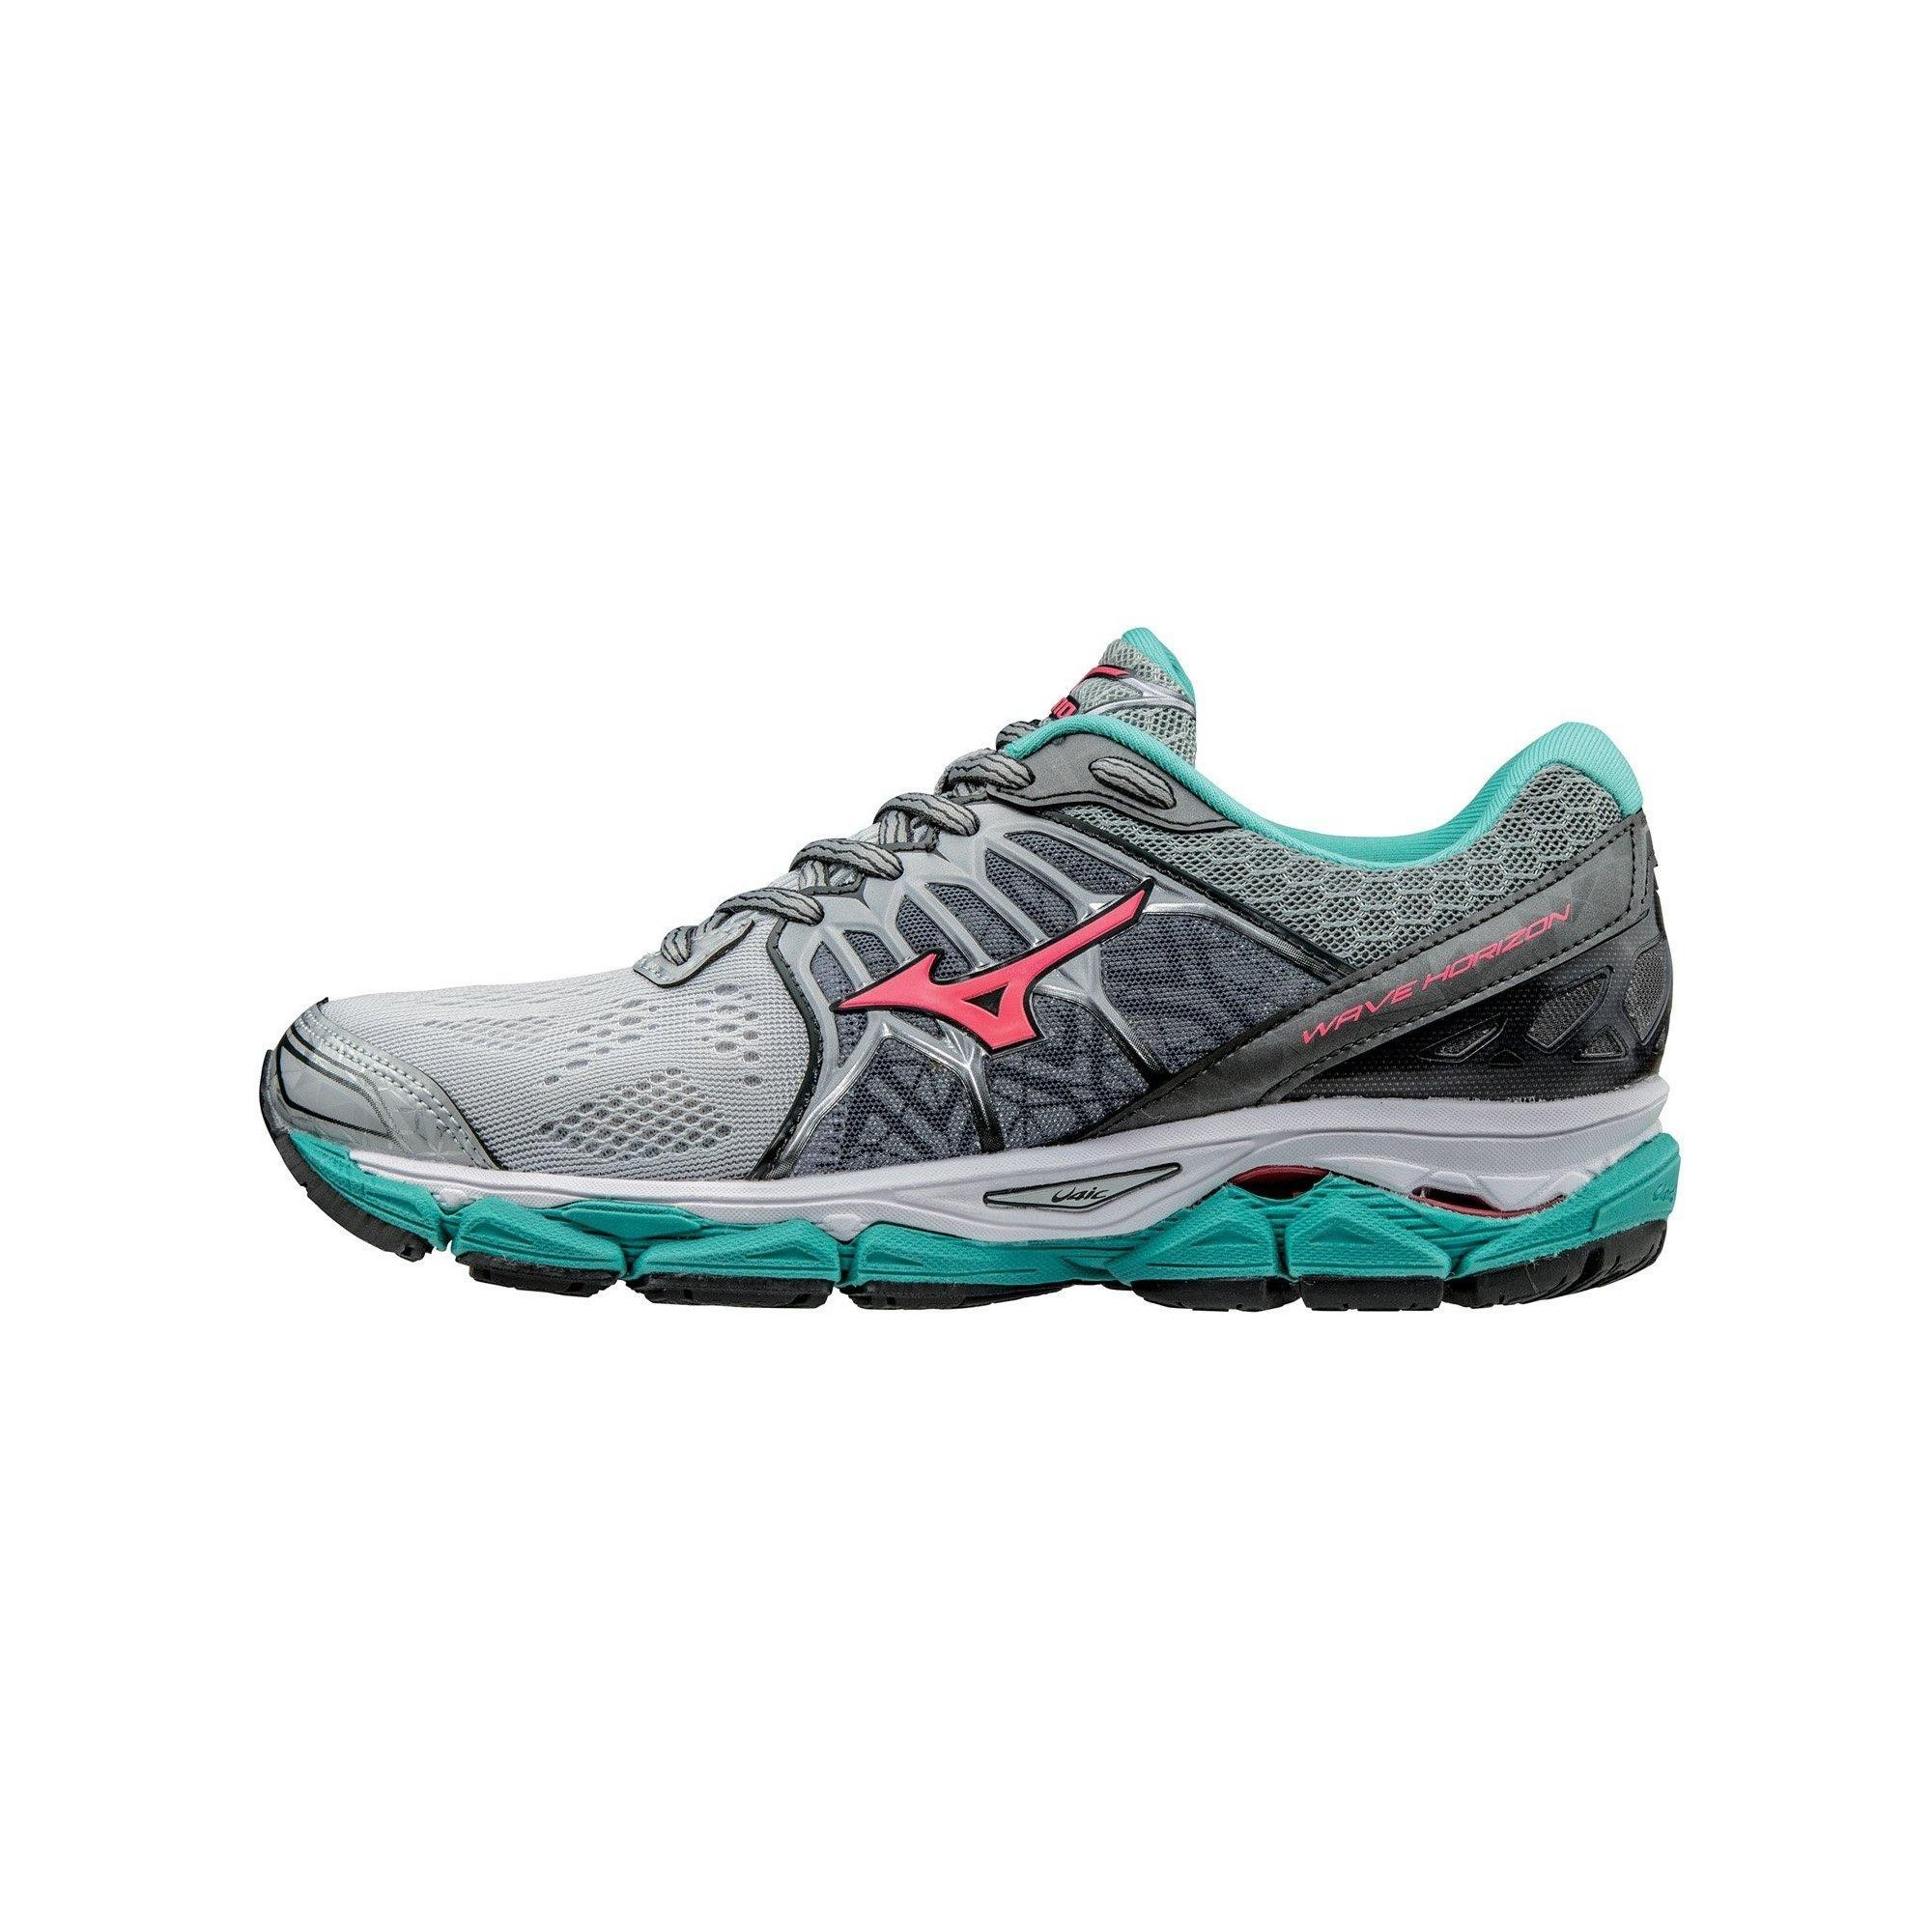 Mizuno Women's Wave Horizon Running Shoe Womens Size 7.5 In